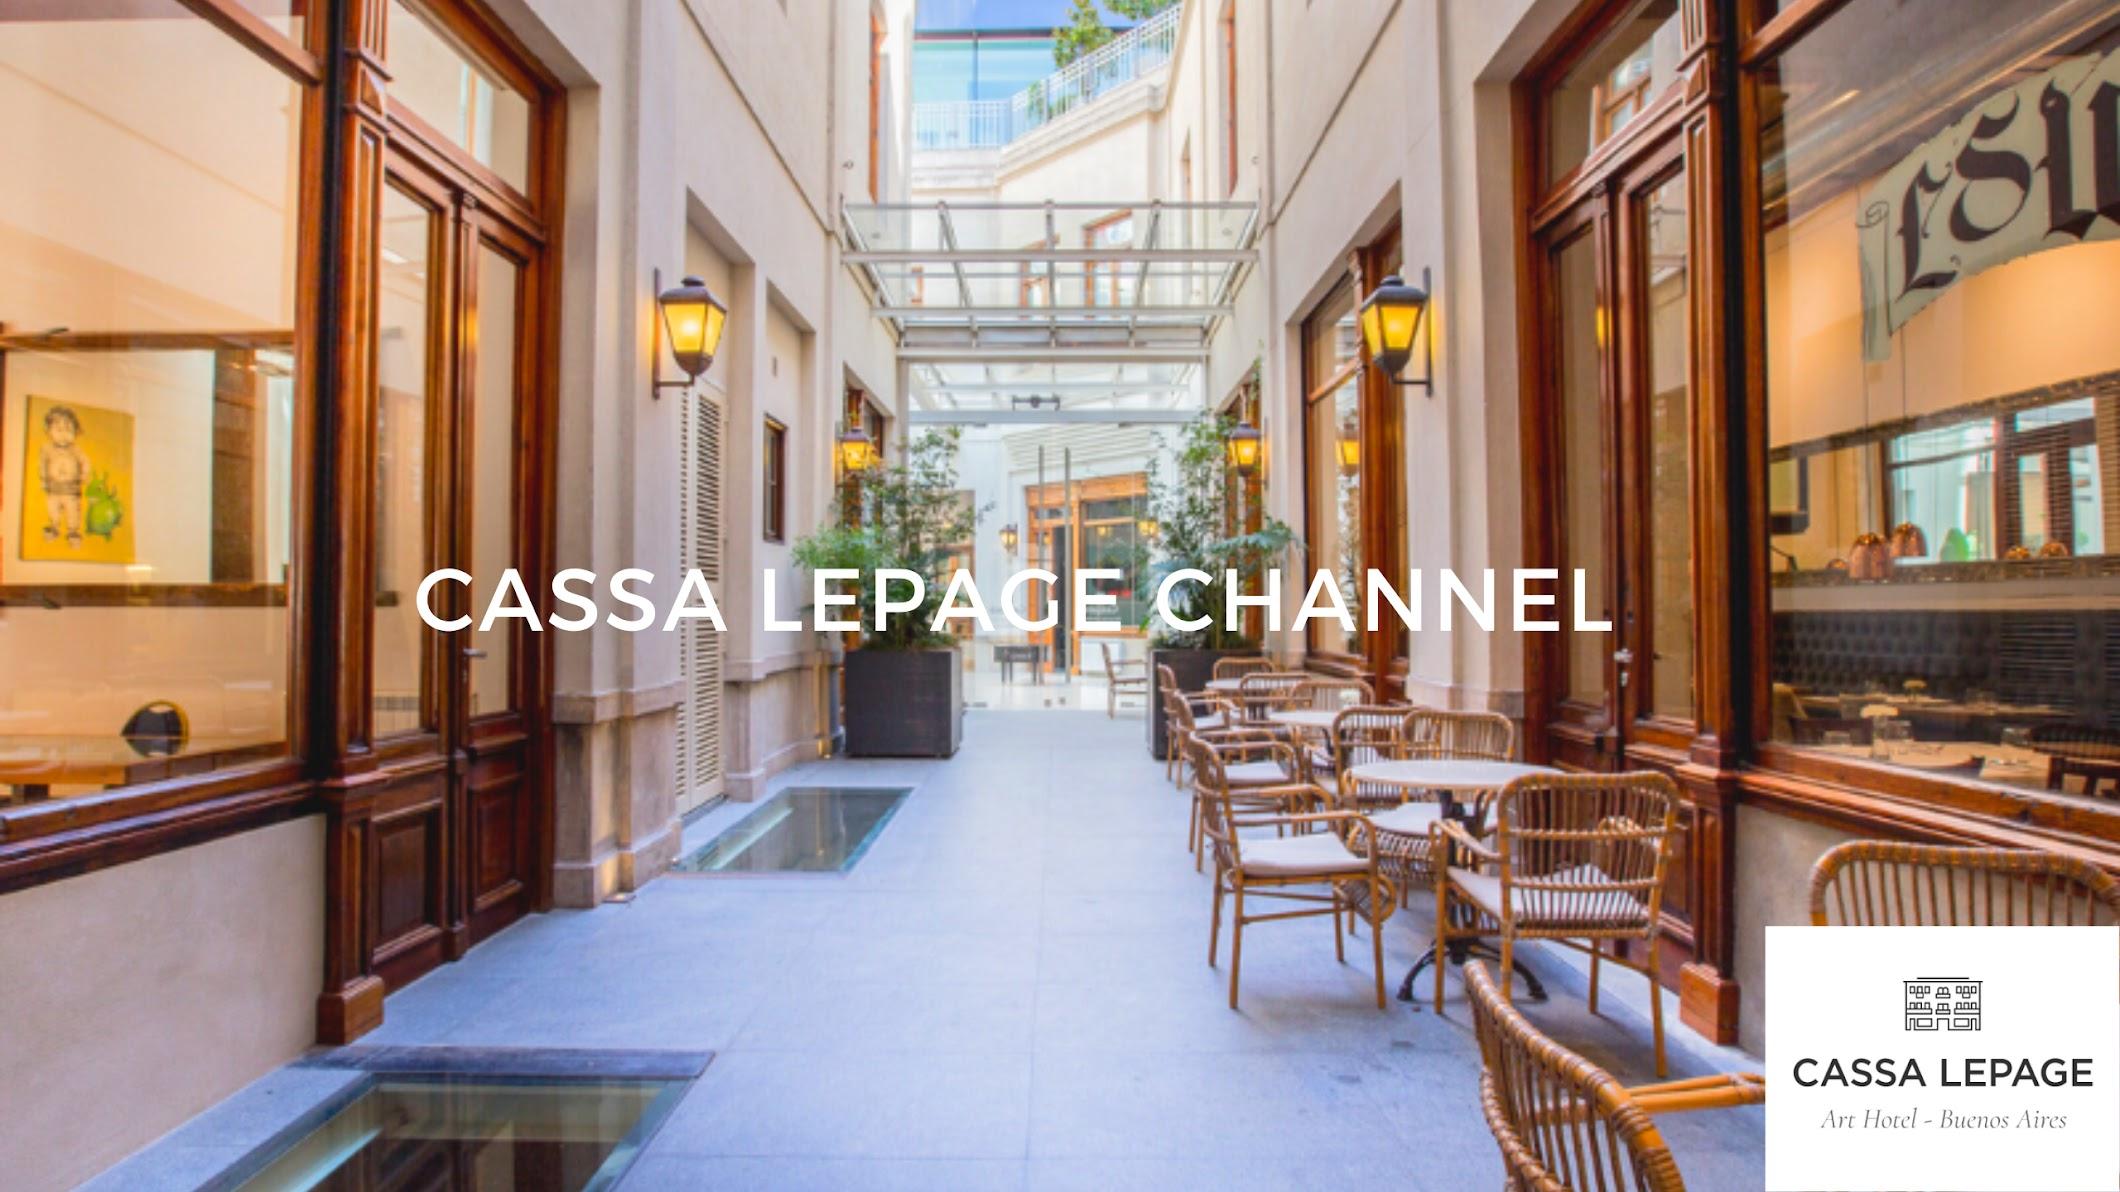 Cassa Lepage